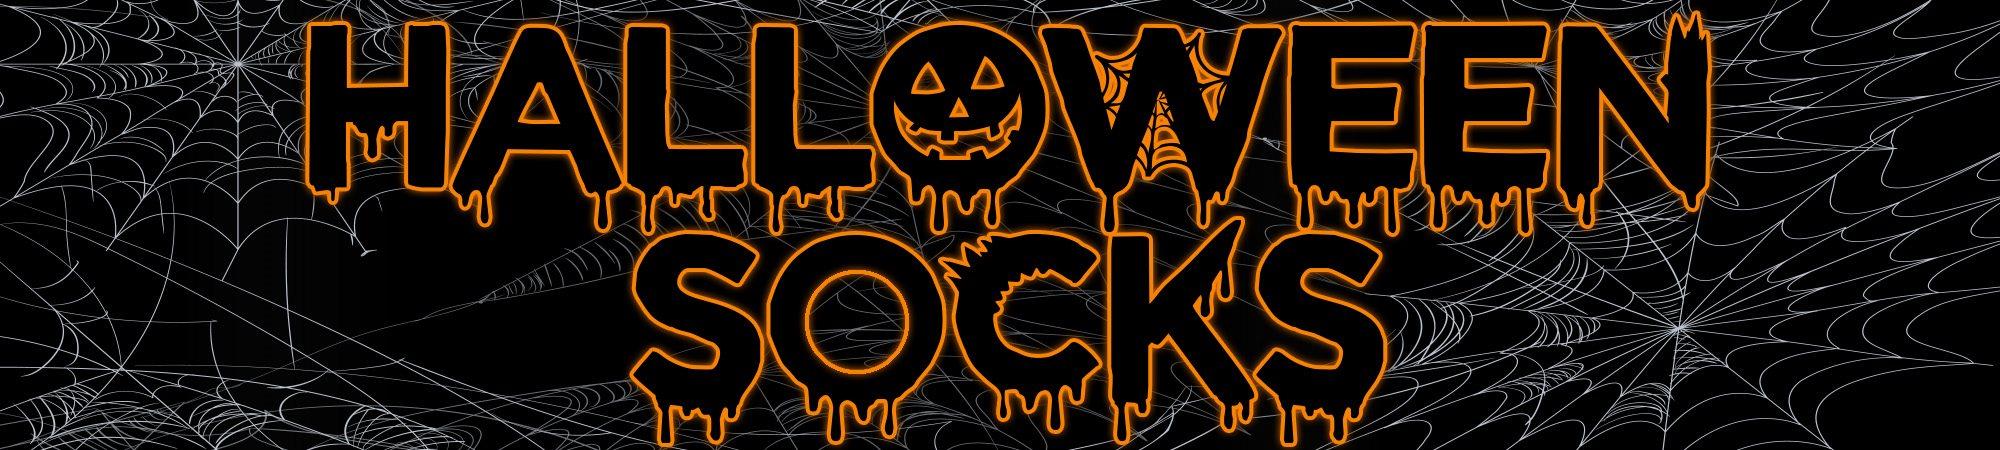 SockGuy_Halloween